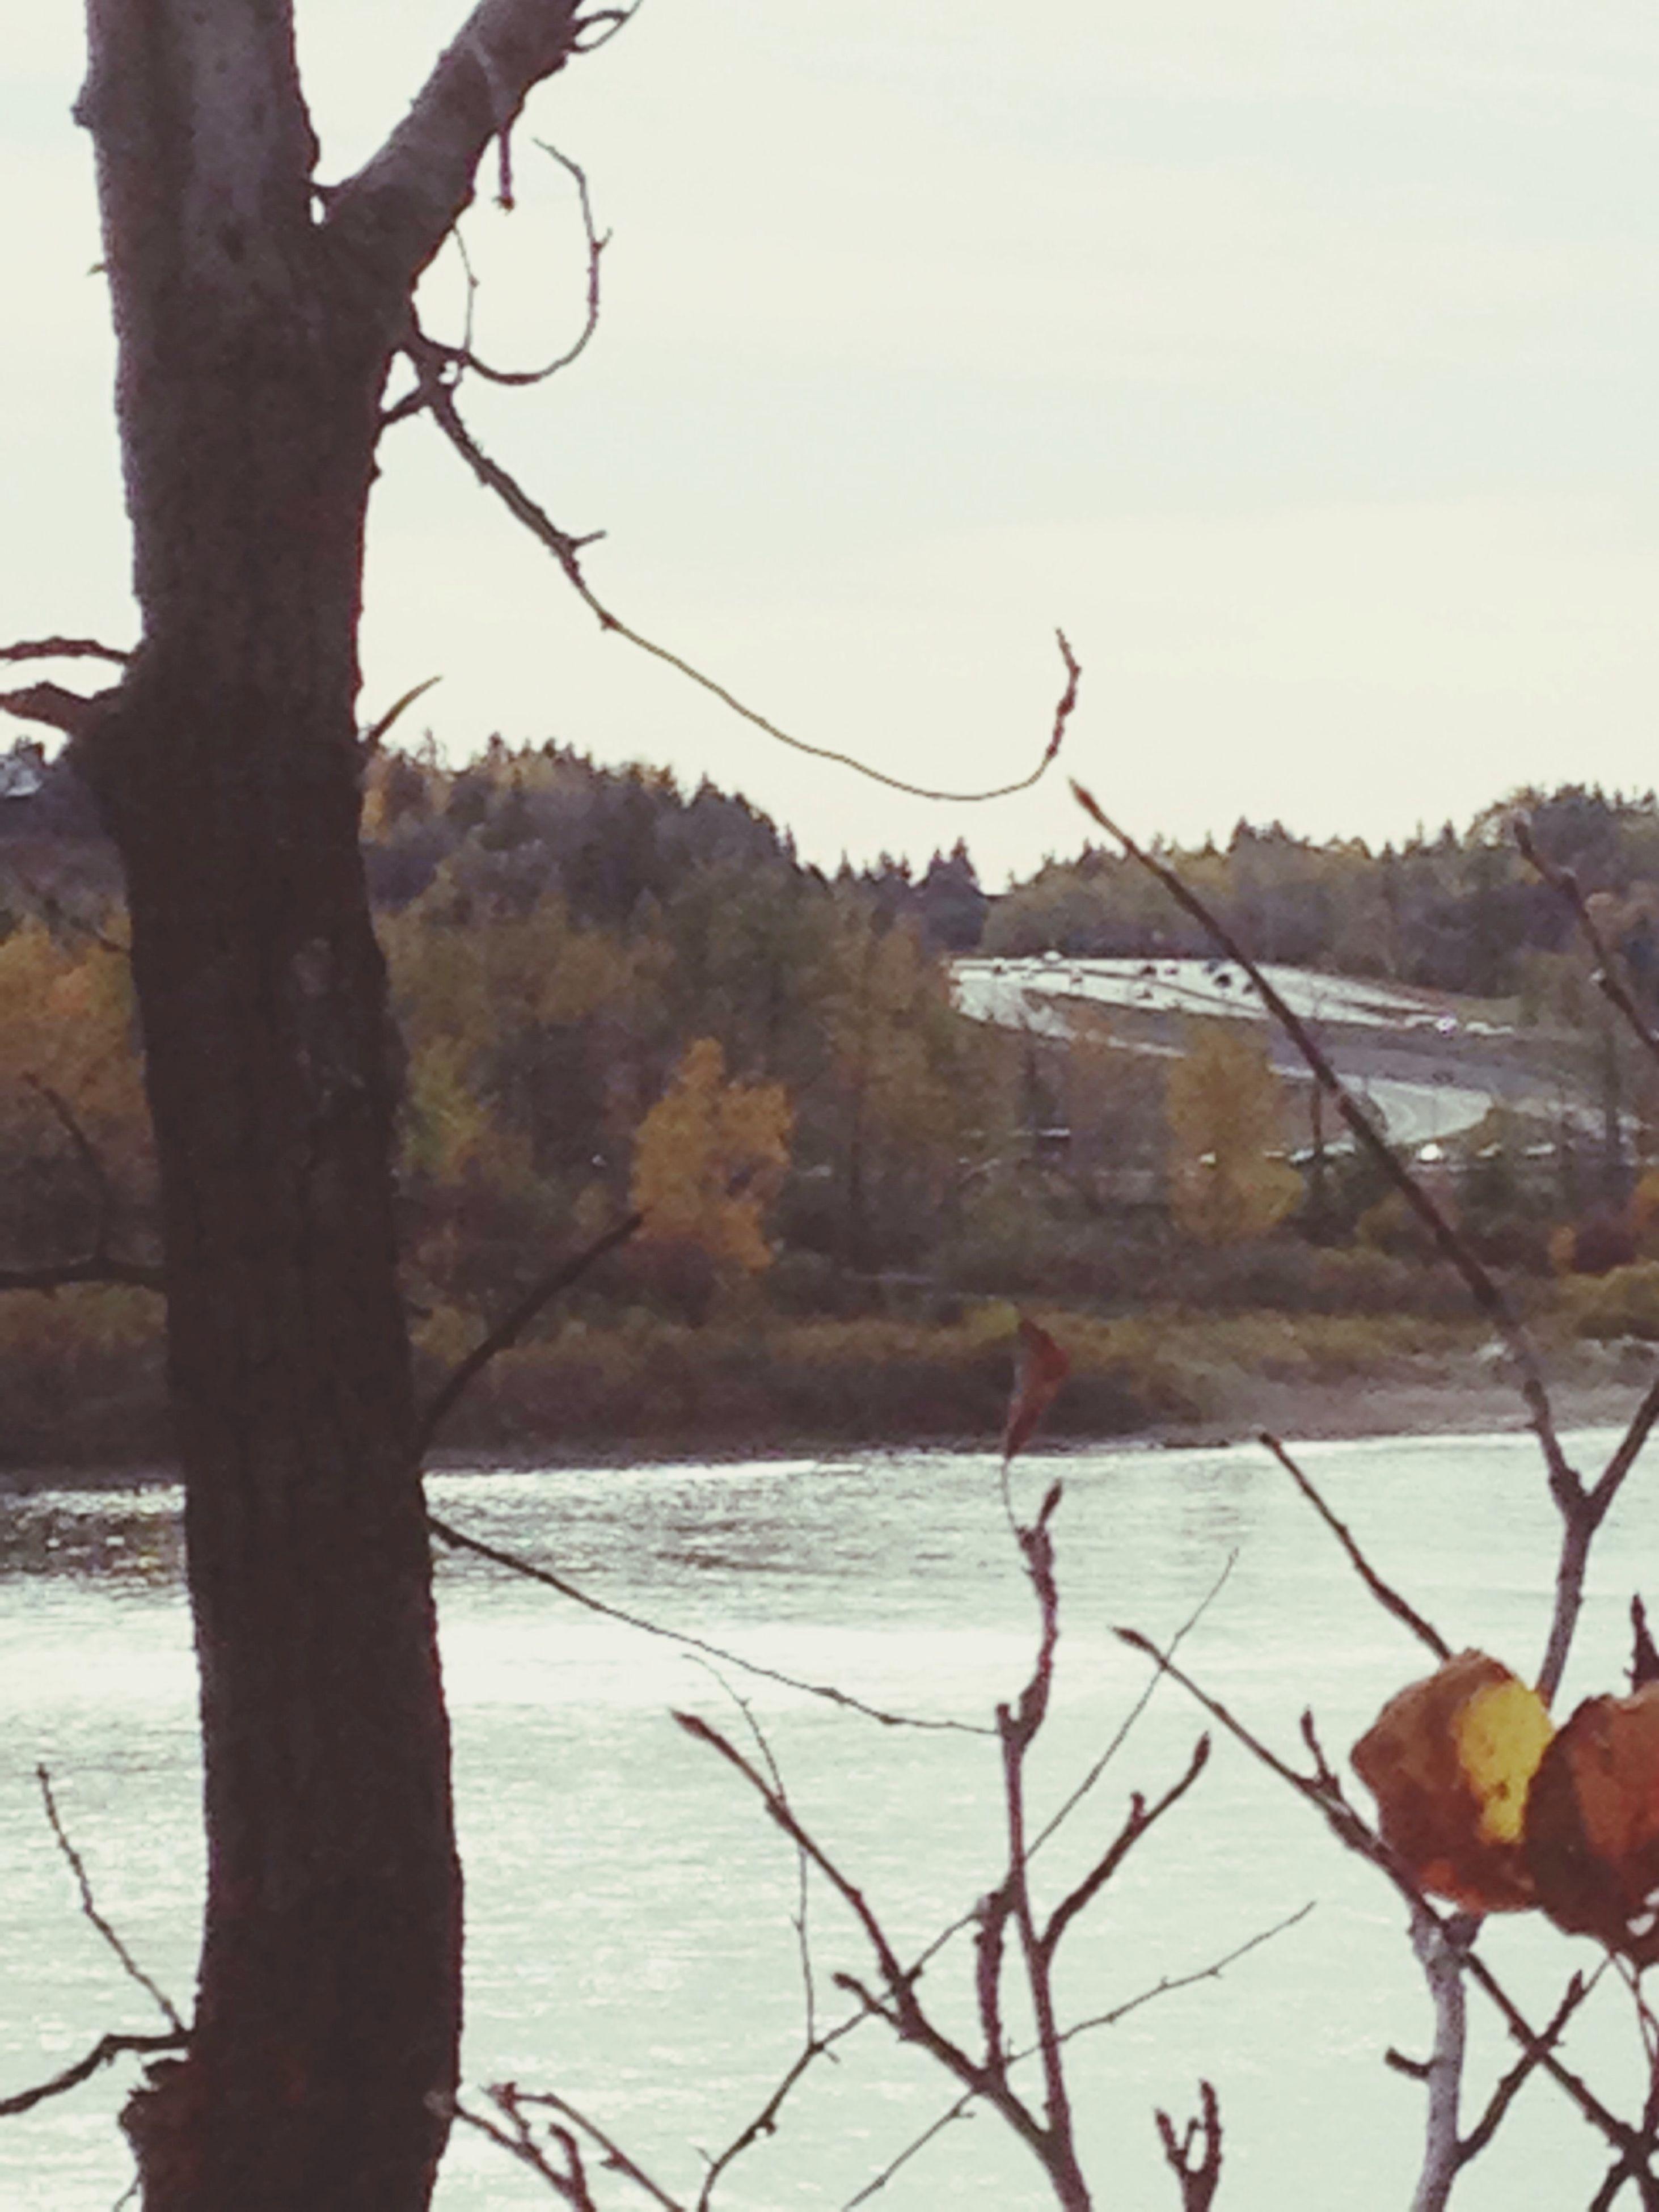 winter, bare tree, water, branch, cold temperature, snow, tranquility, tree, lake, tranquil scene, nature, scenics, season, beauty in nature, river, sky, weather, landscape, frozen, non-urban scene